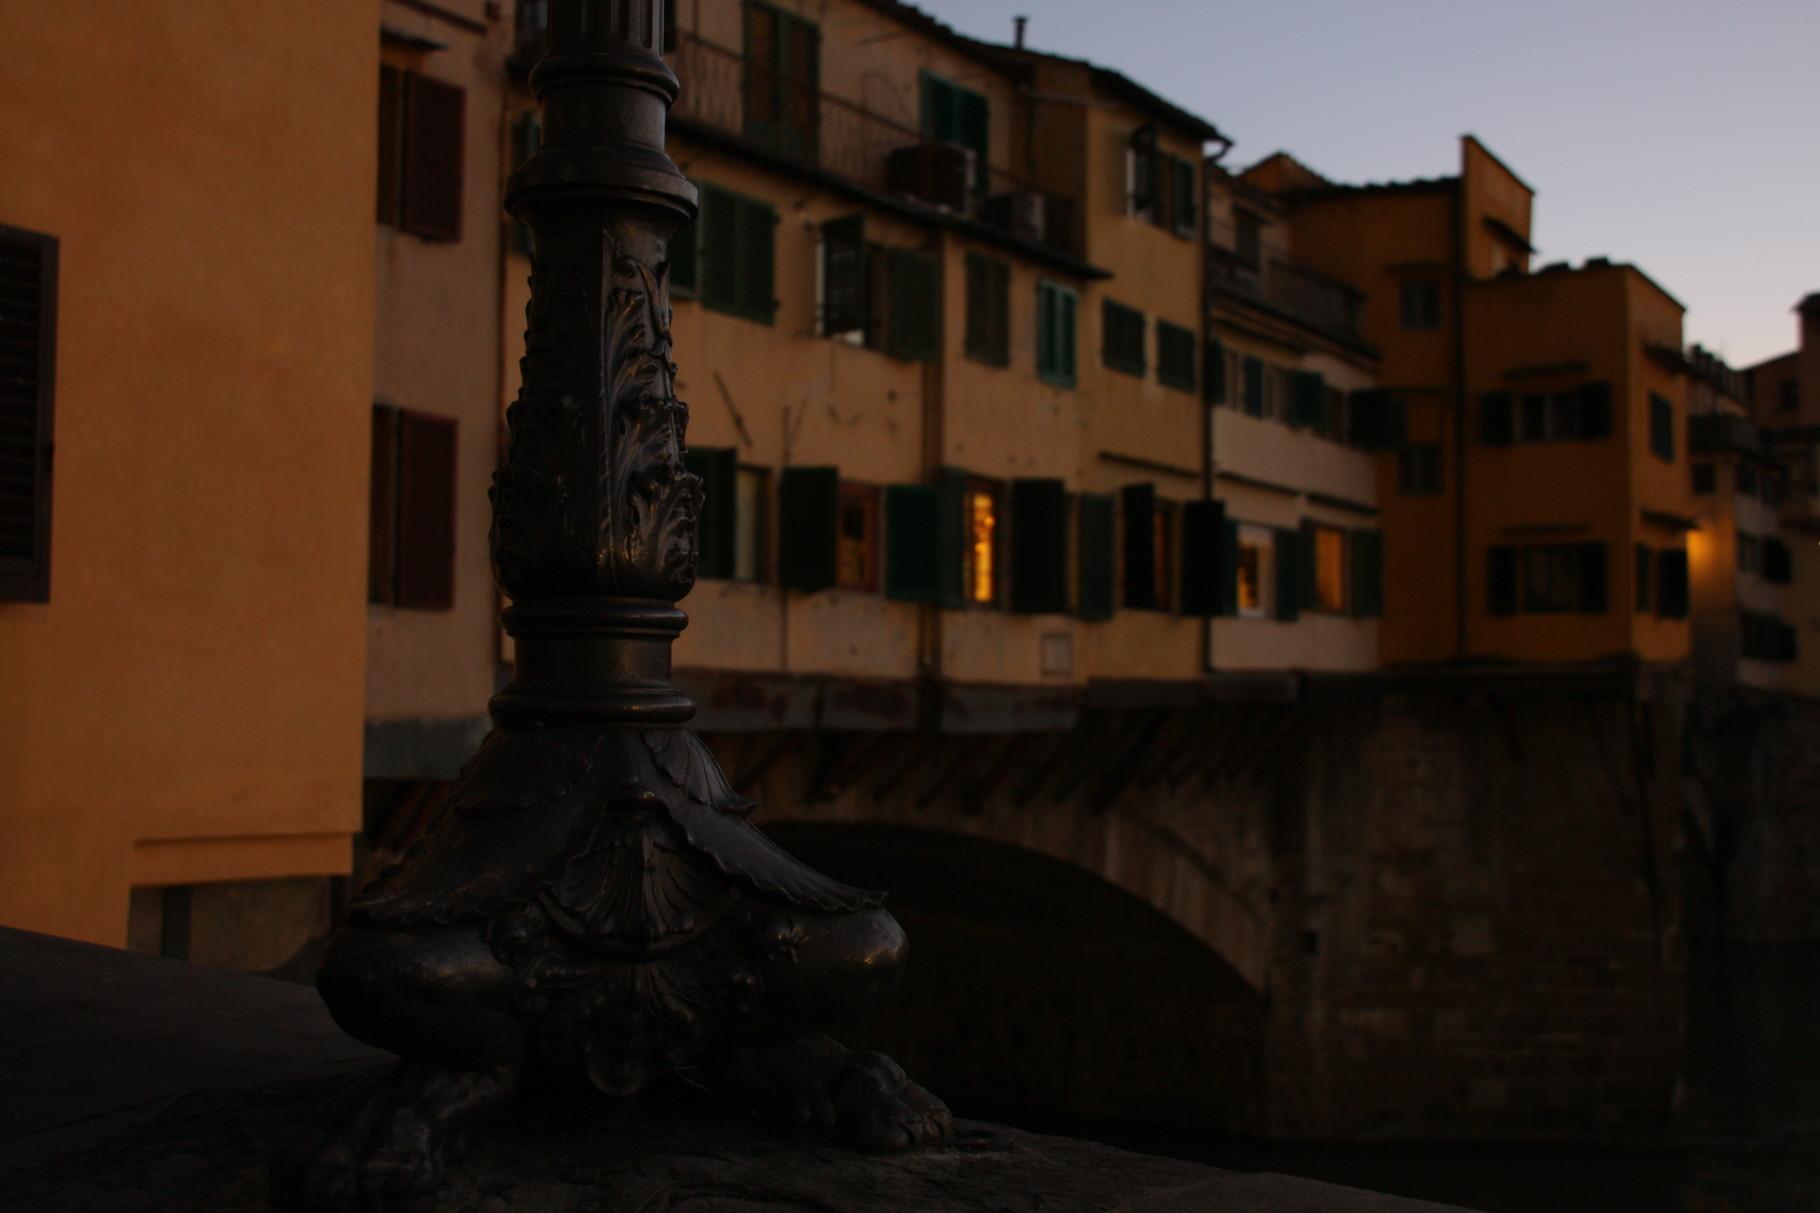 54_Florenz.